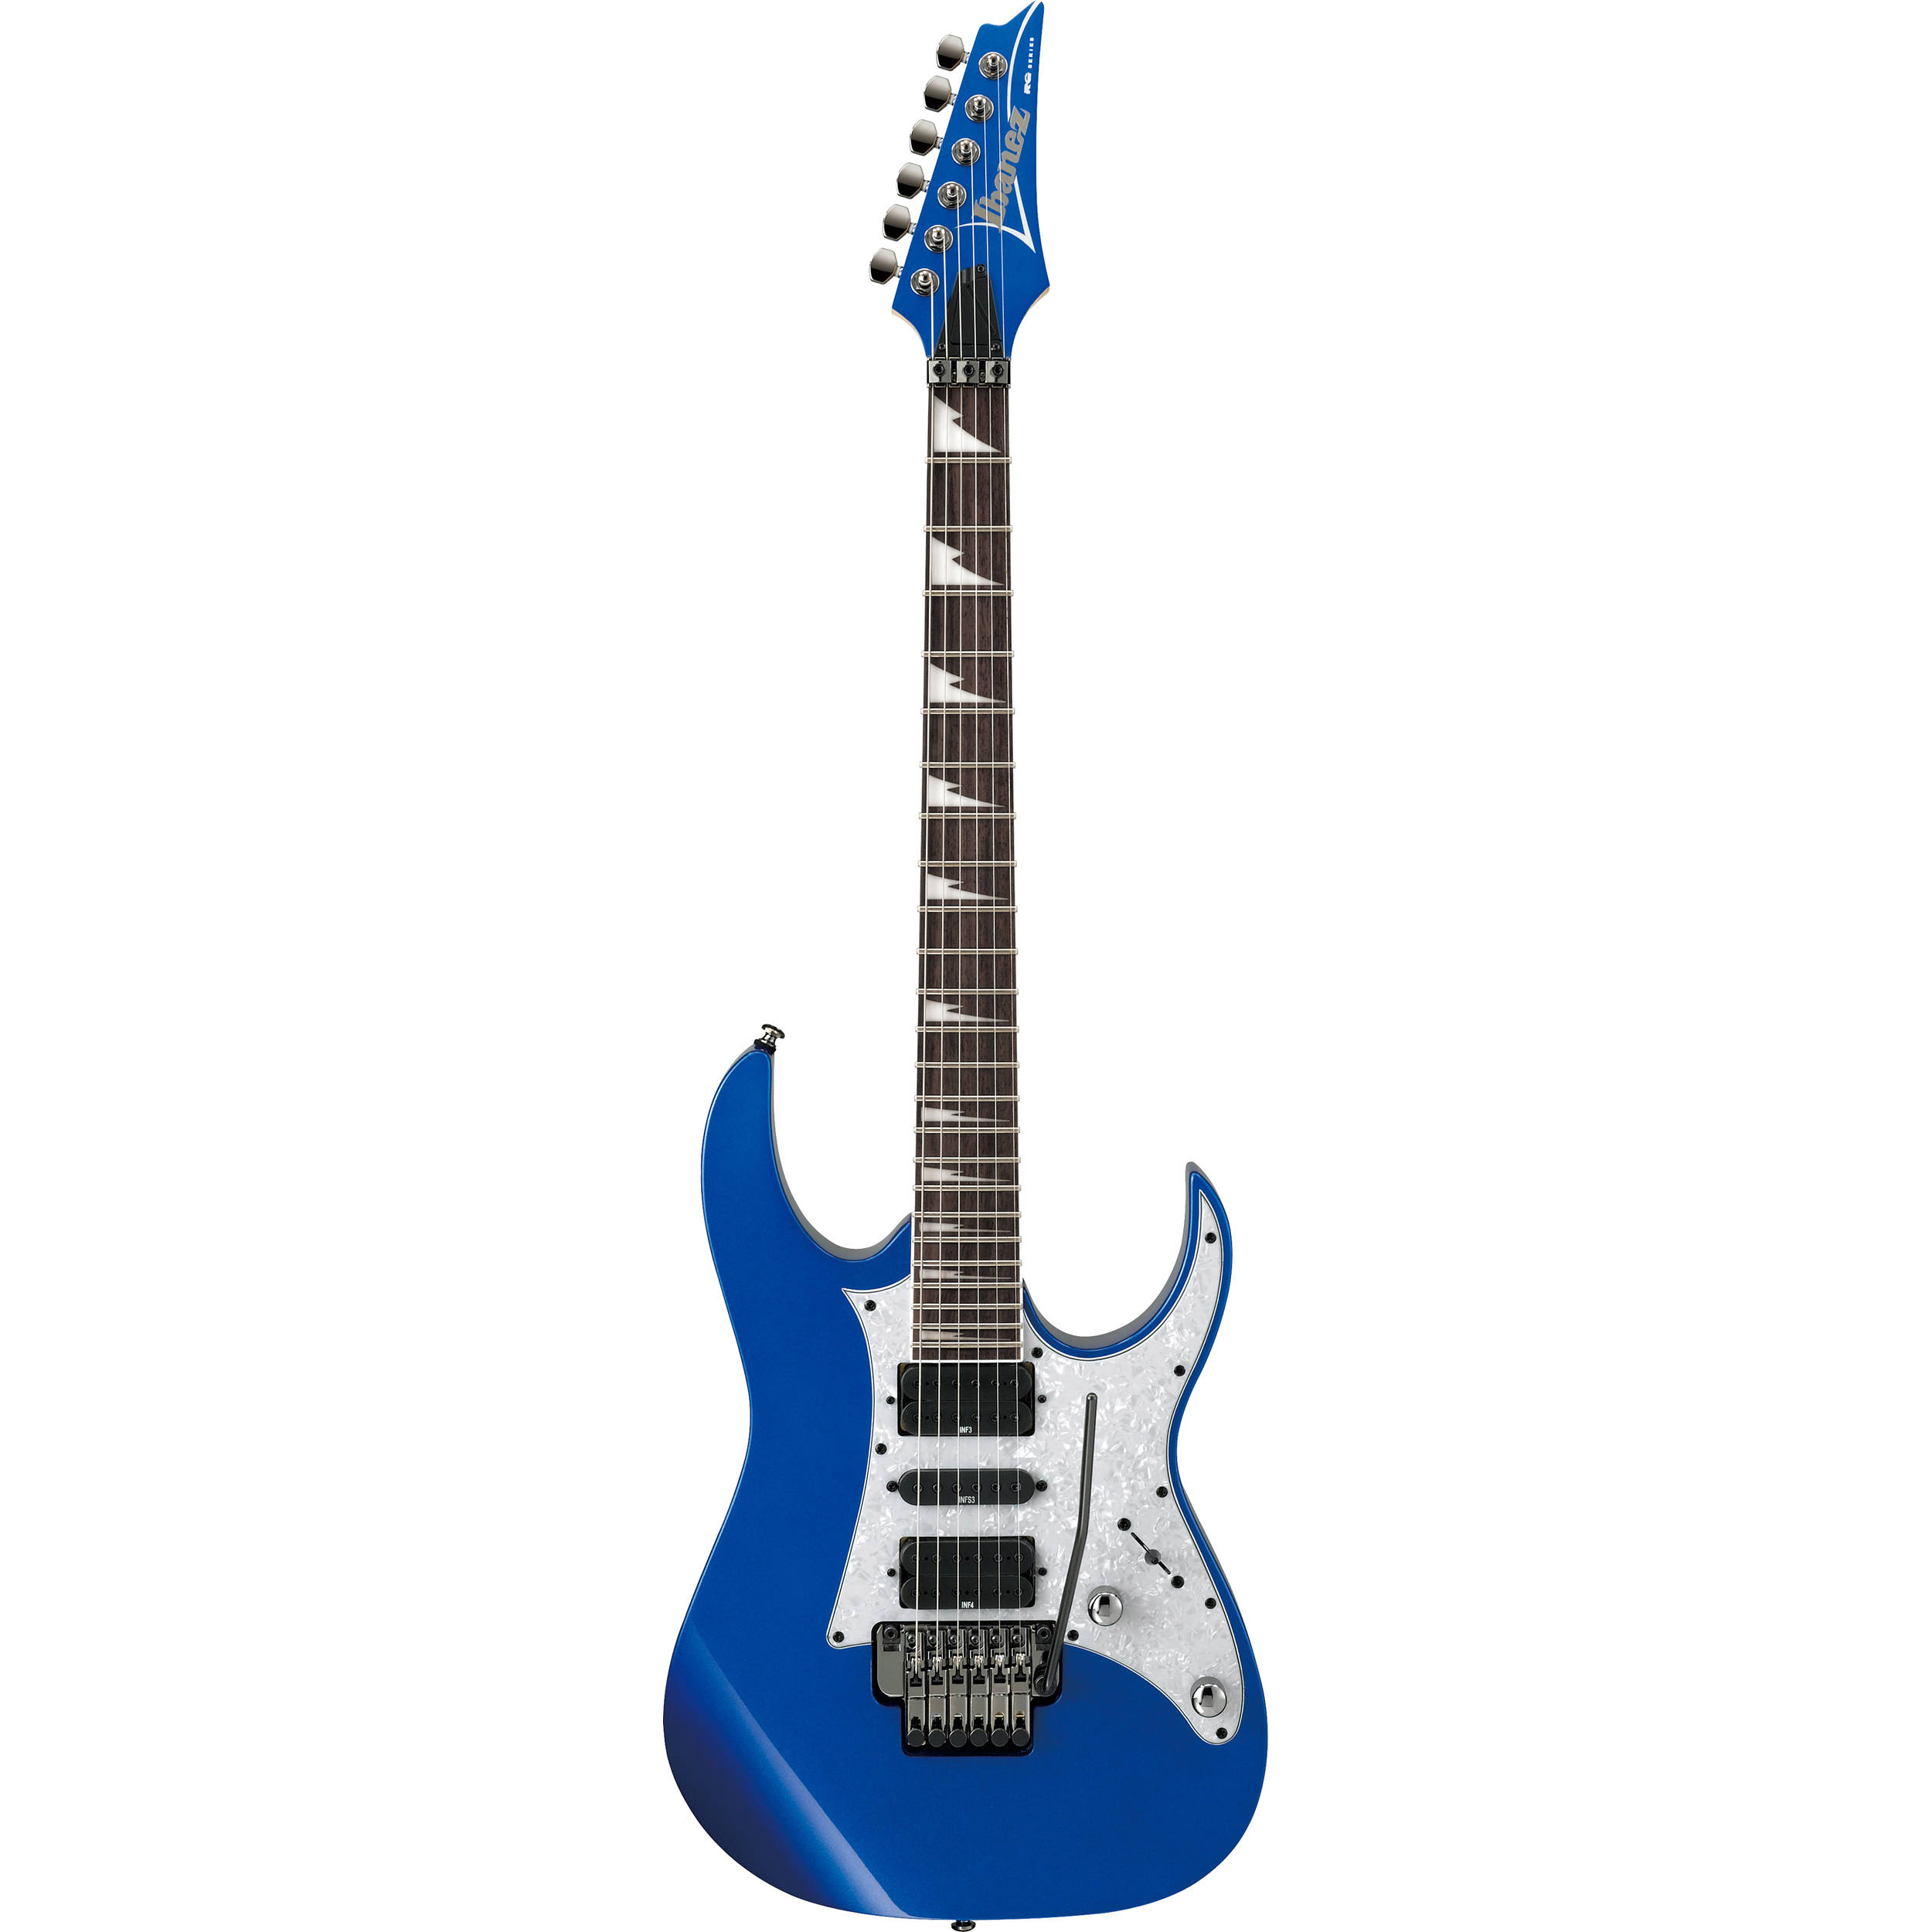 Ibanez Rg450dx Rg Series Electric Guitar Rg450dxslb B Amp H Photo